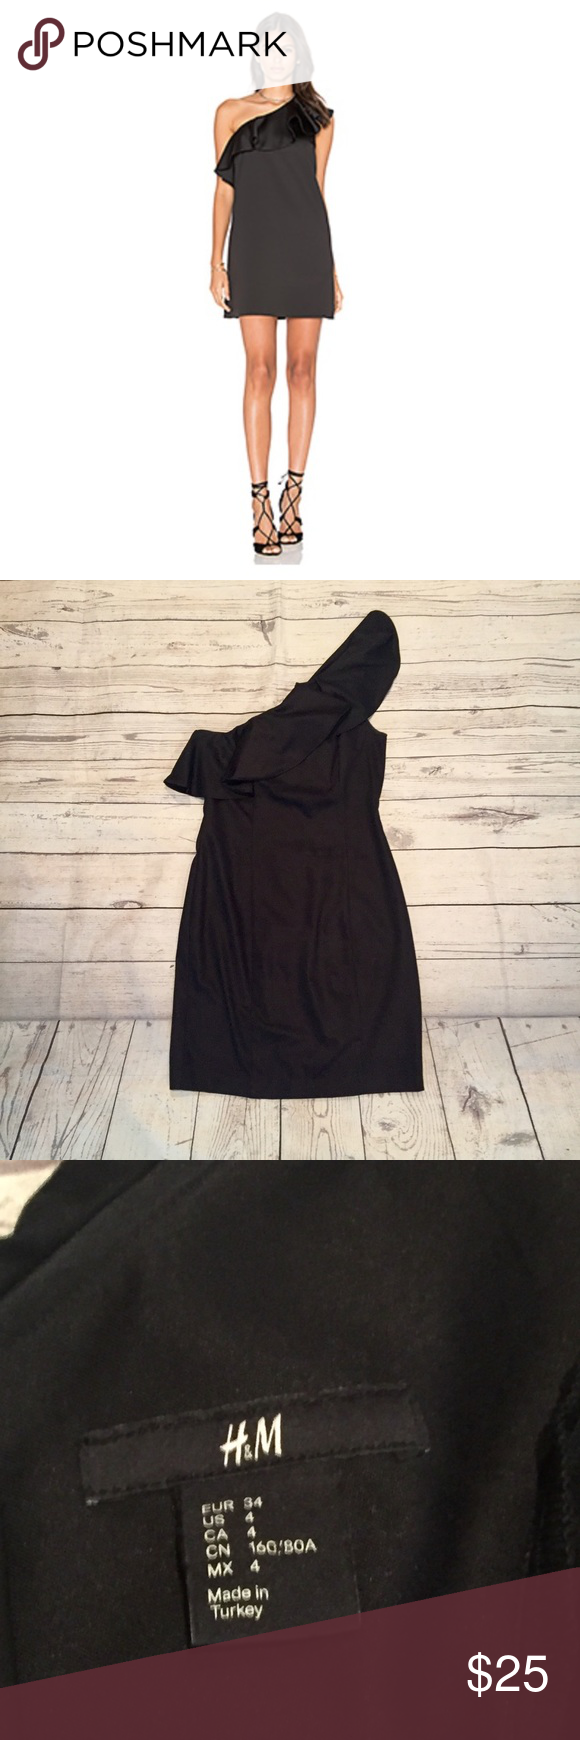 Black One Shoulder Ruffle Mini Dress Beautiful Black Sateen One Shoulder Ruffle Mini Dress With Sil Ruffle Mini Dress Perfect Little Black Dress Clothes Design [ 1740 x 580 Pixel ]